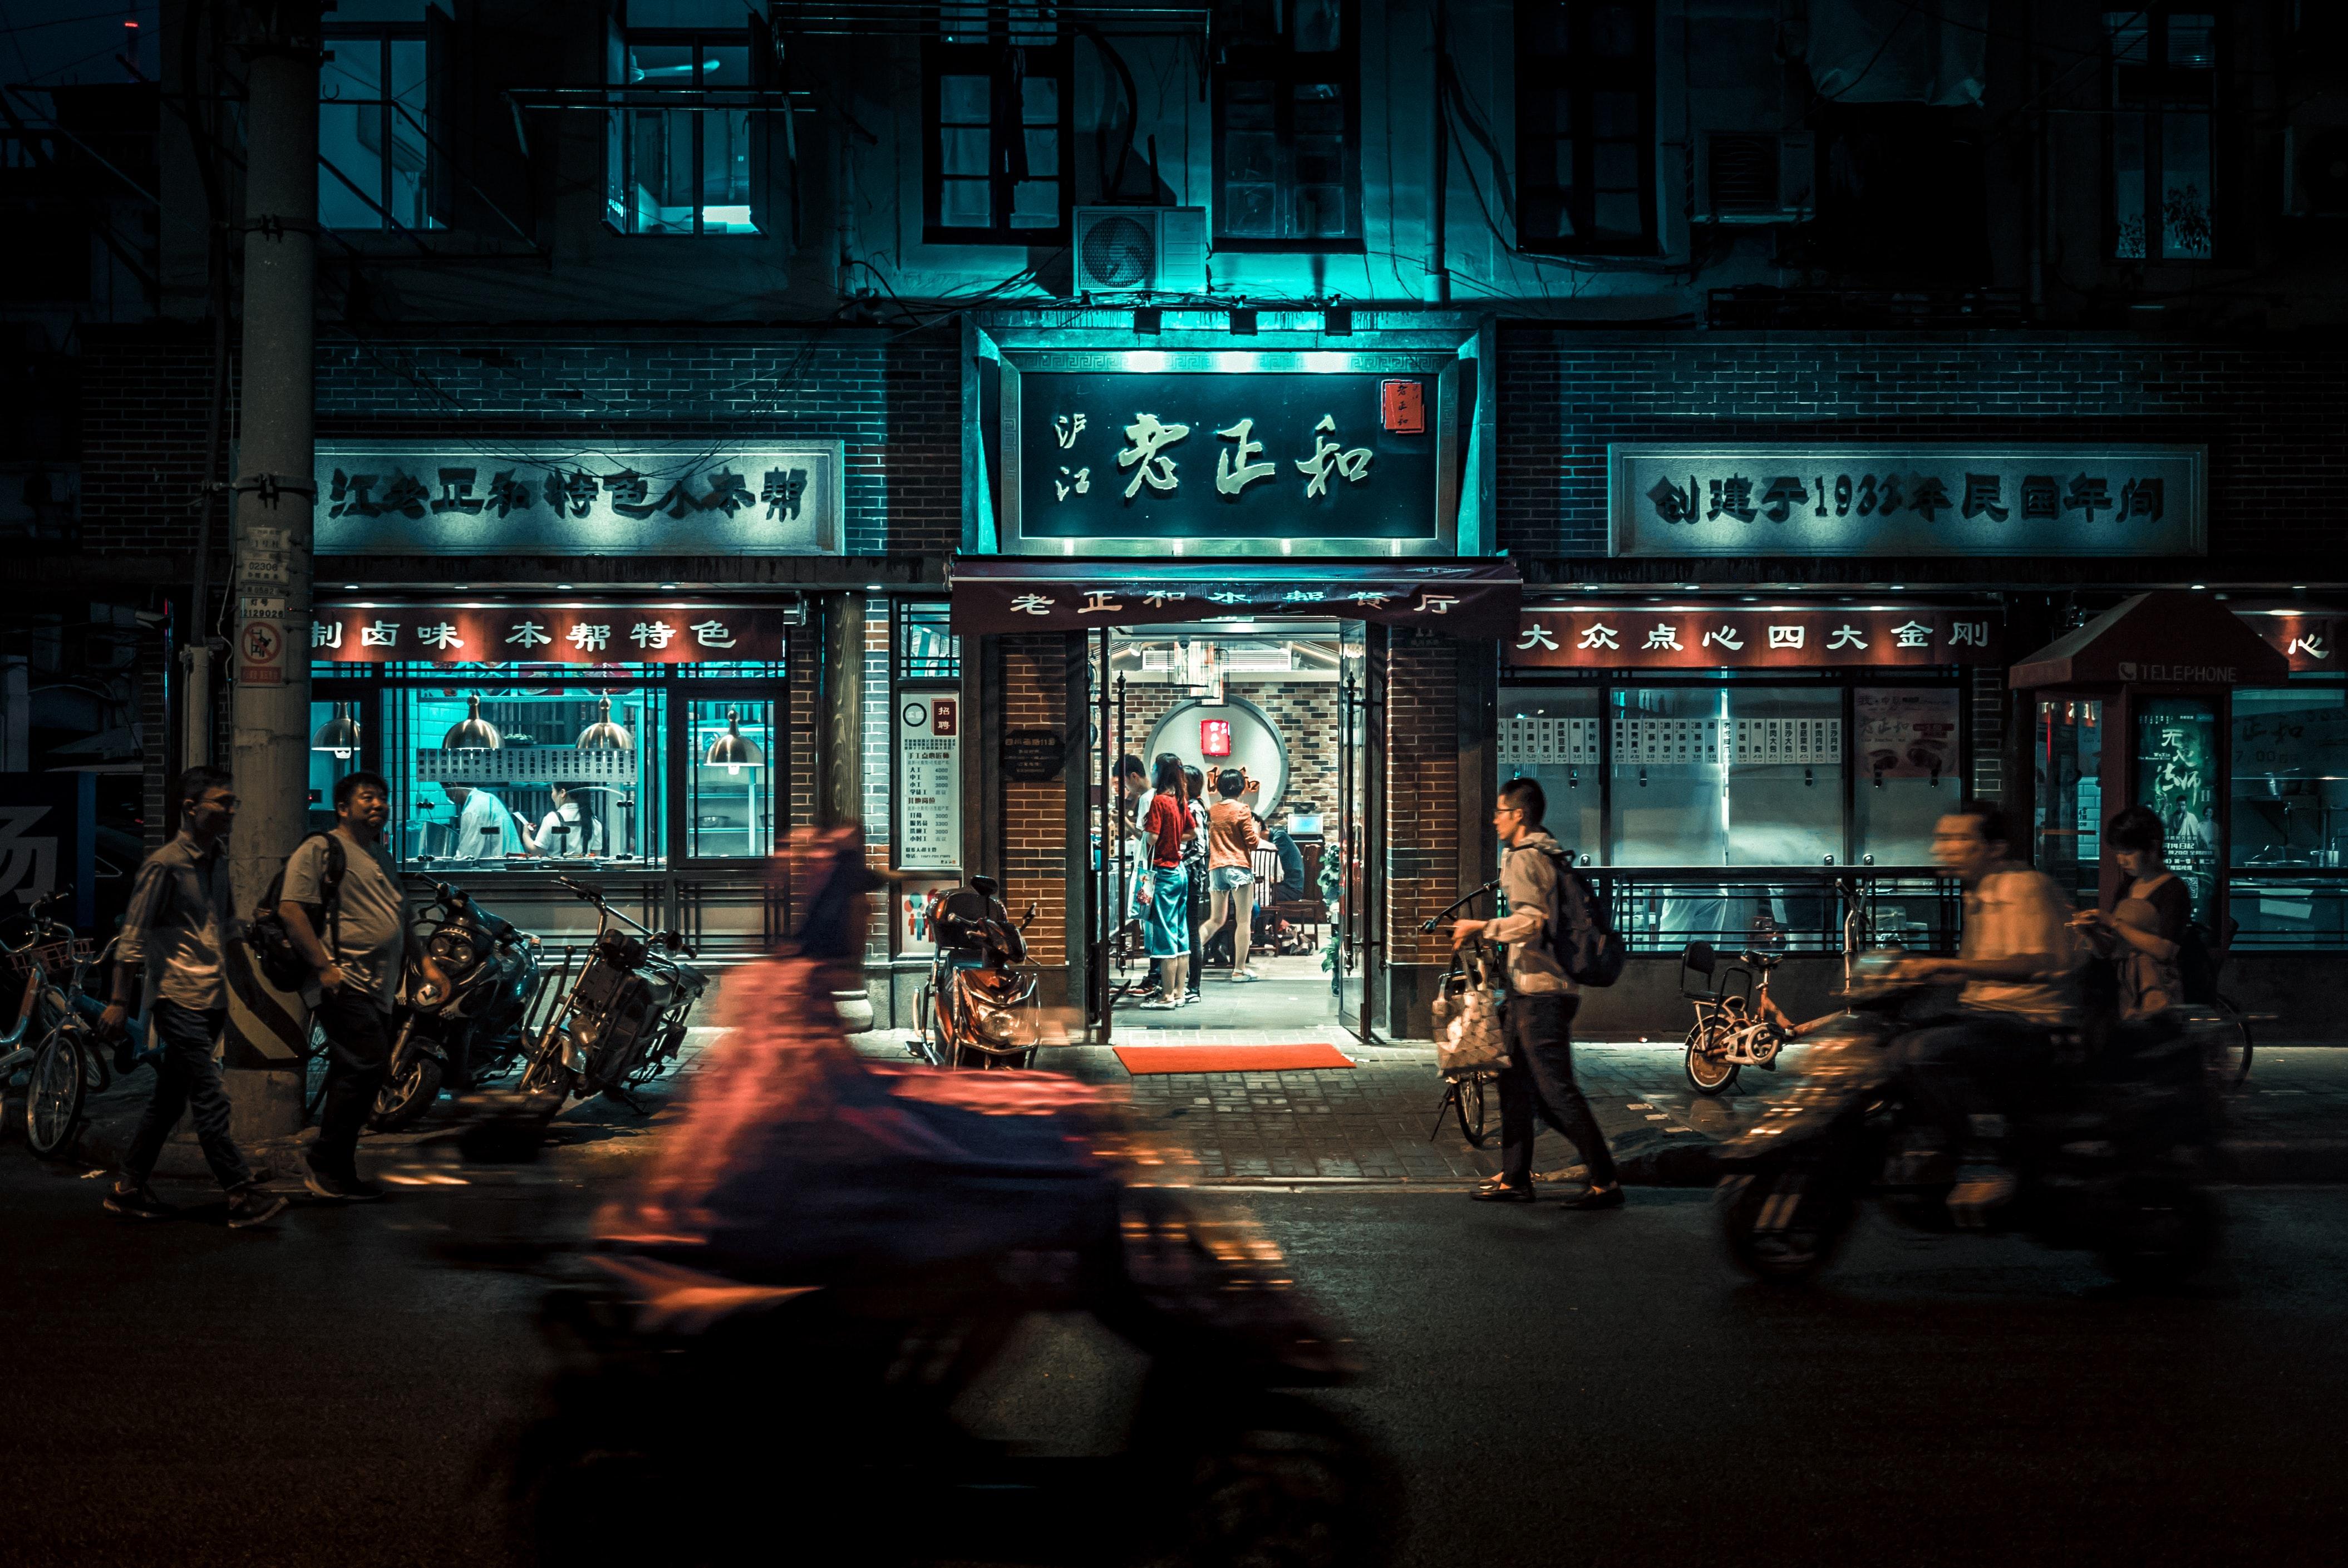 China May Still be Selling Addictive Fentanyl Internationally